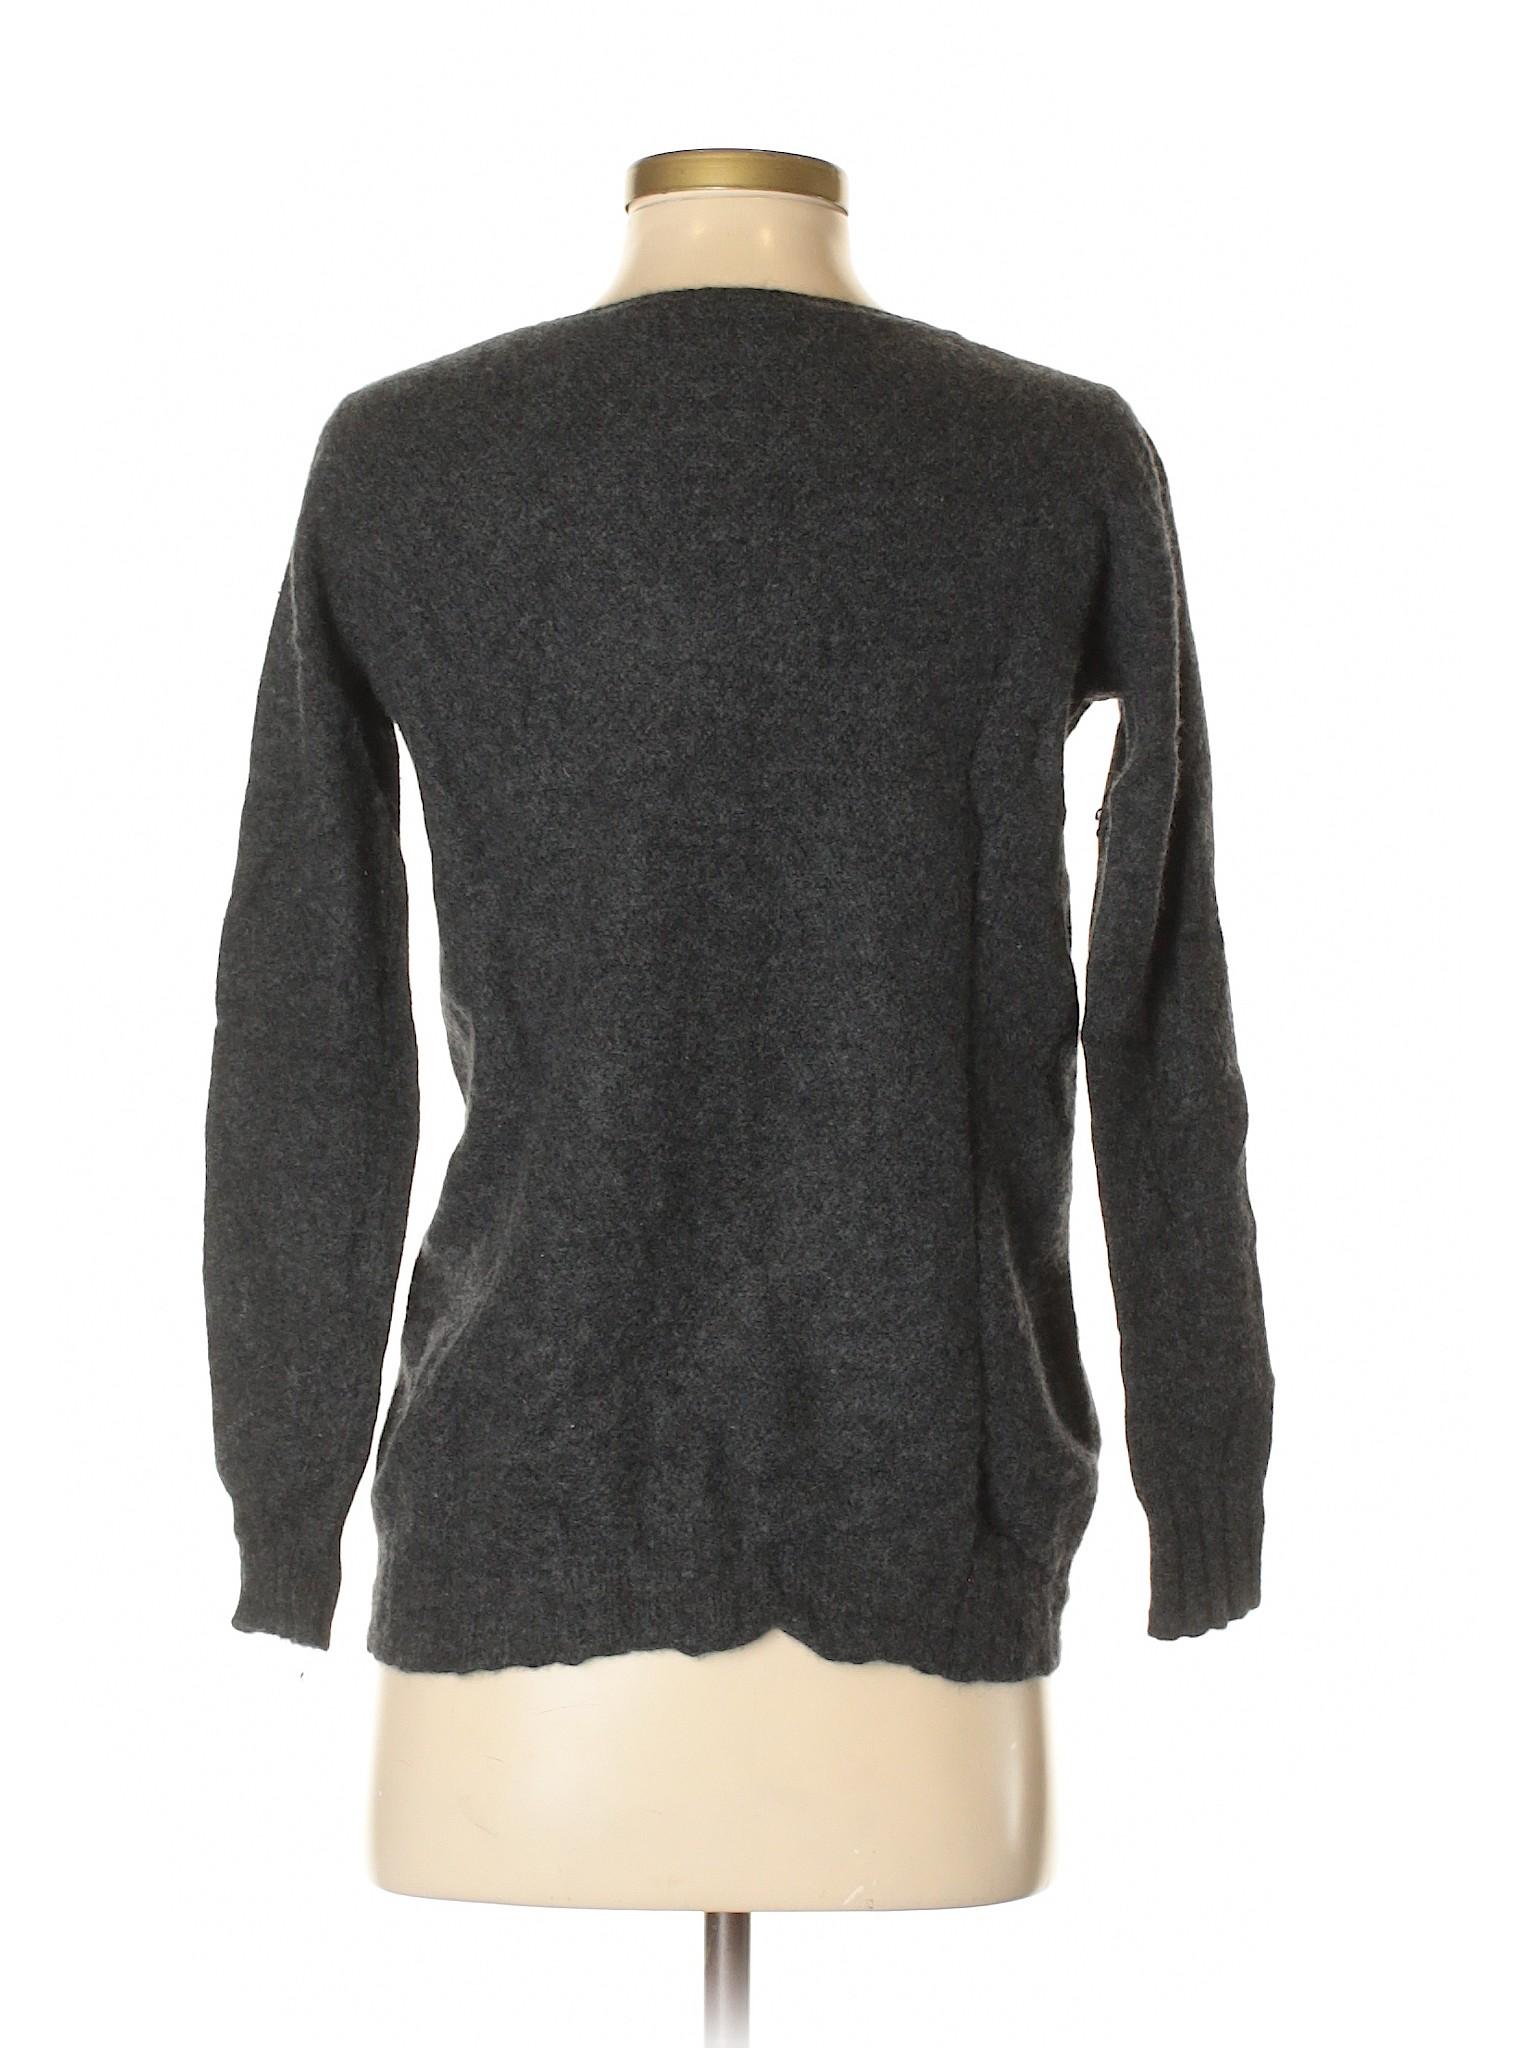 Sweater Cashmere Boutique Ply Cashmere Pullover winter qtwX1wxO